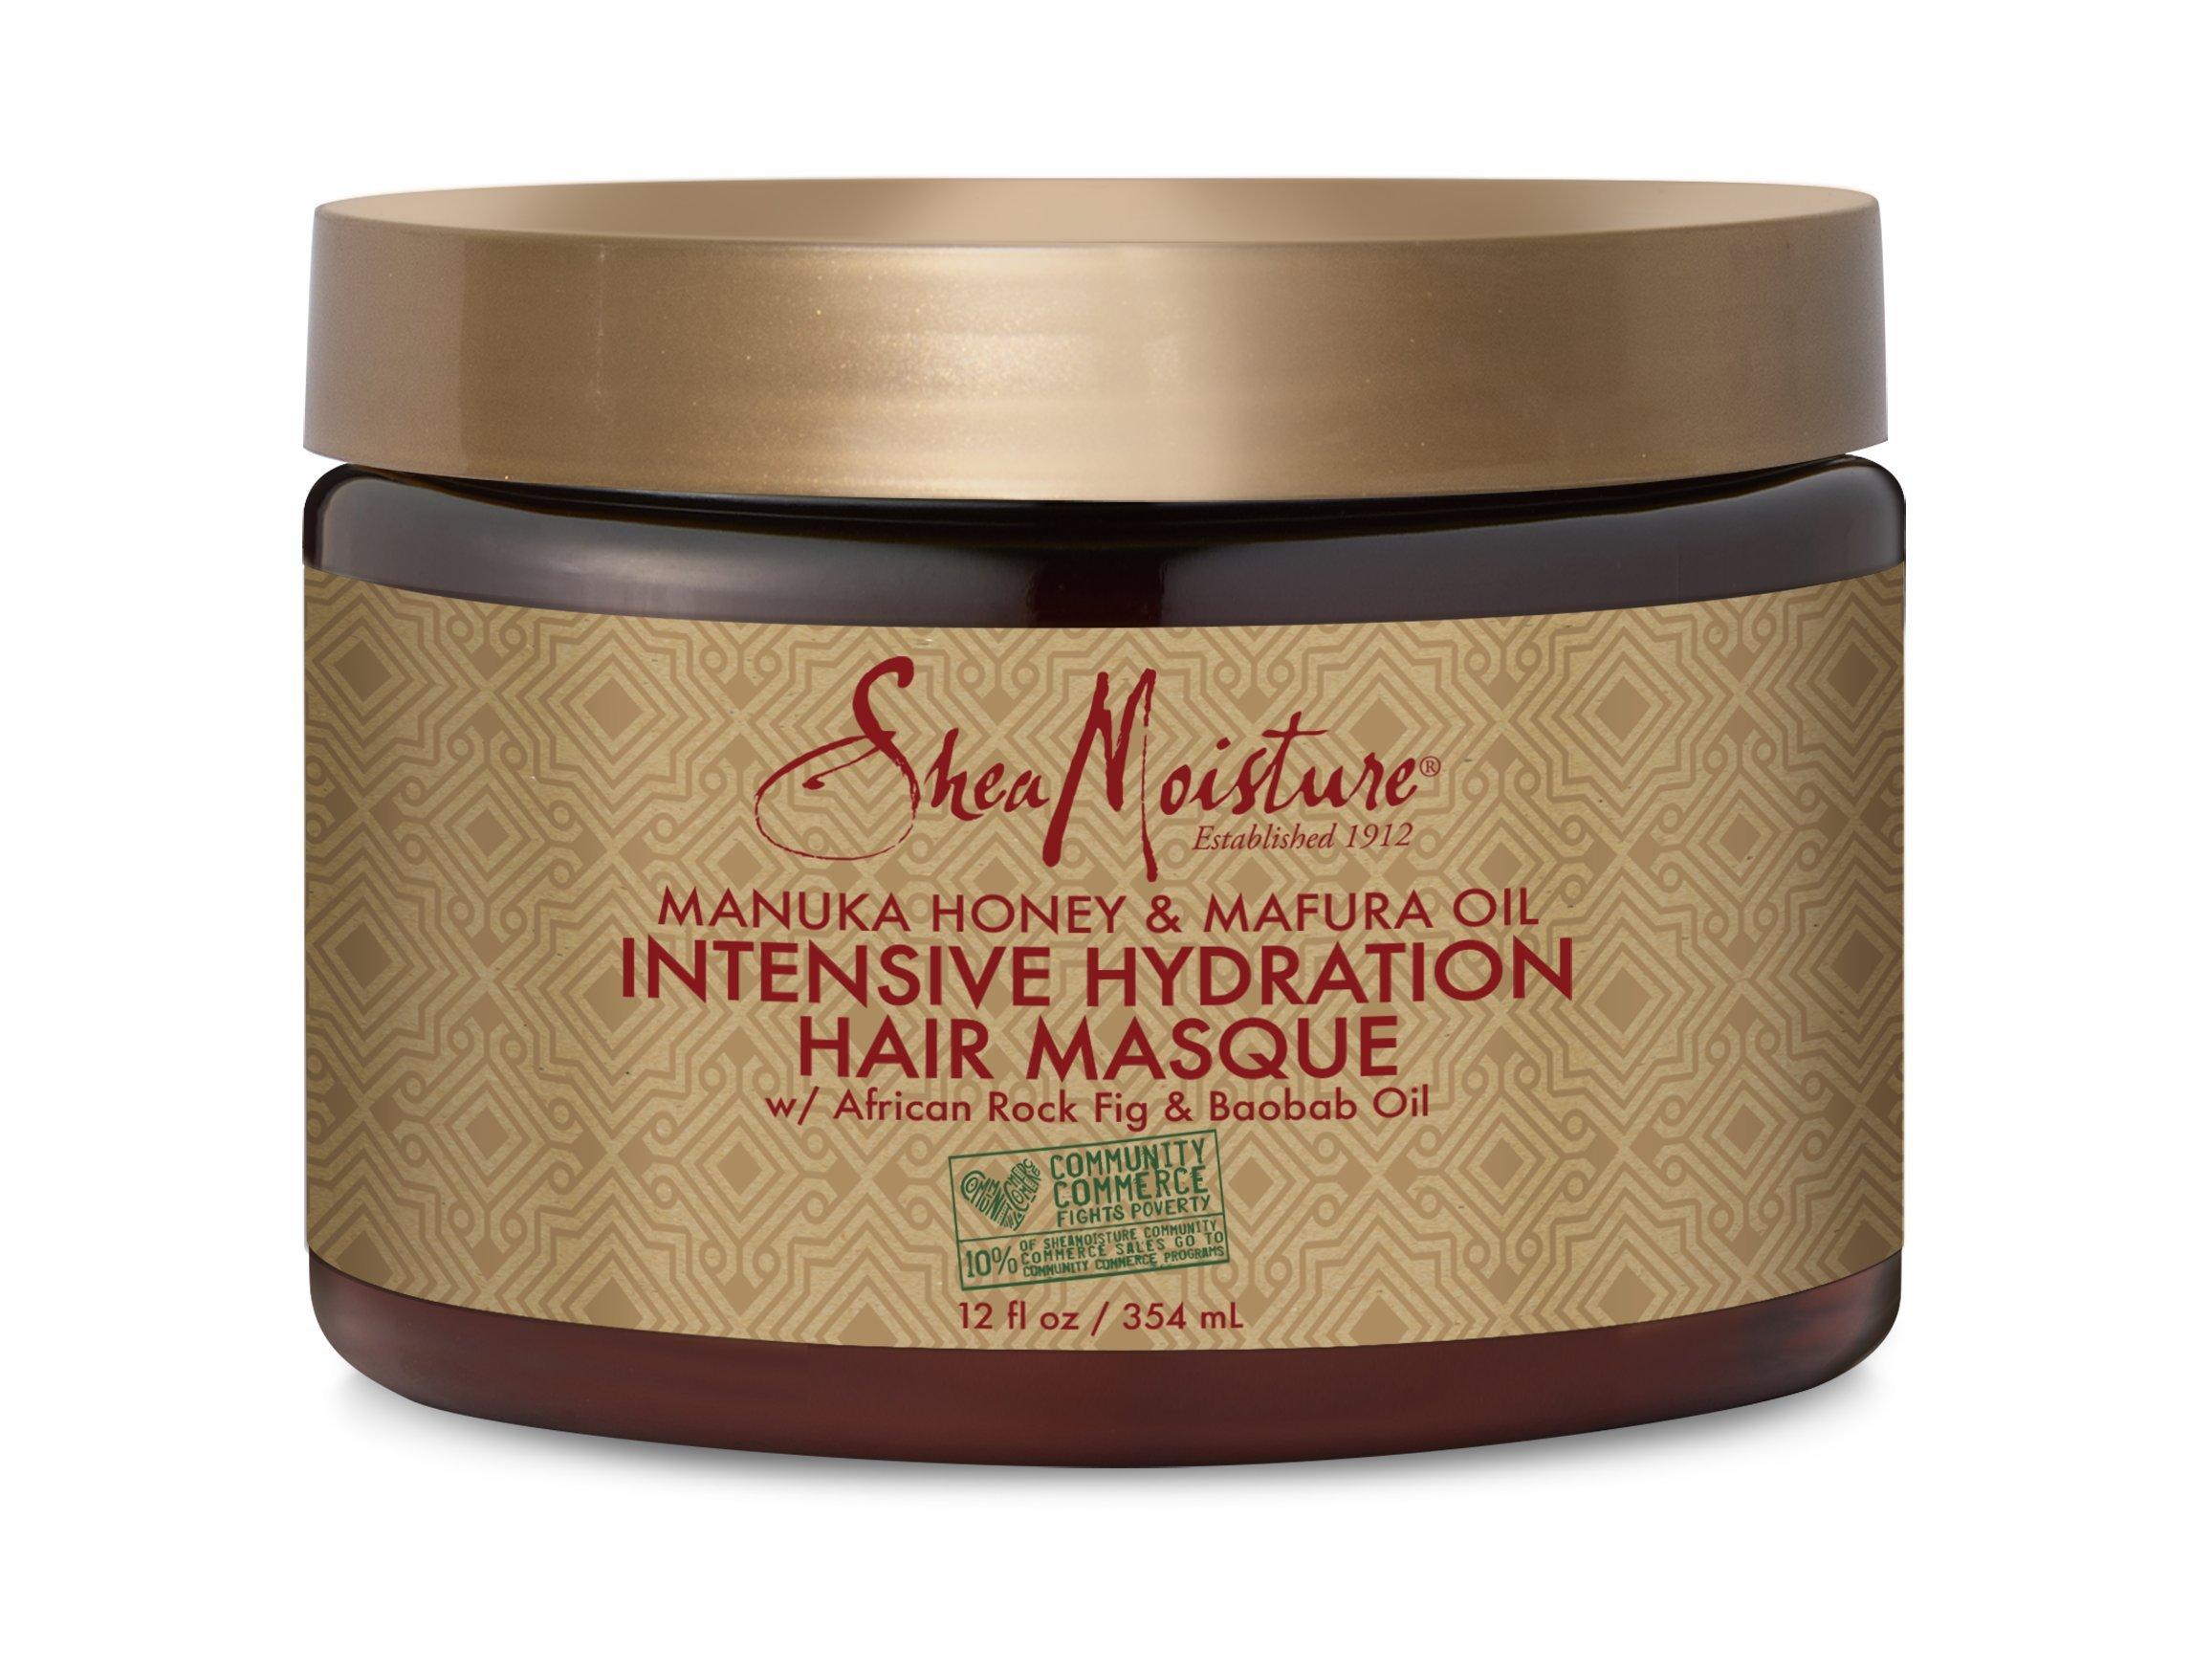 SheaMoisture - Sheamoisture Manuka Honey &Mafura Oil Intensive Hydration Treatment Masque, 12 Oz